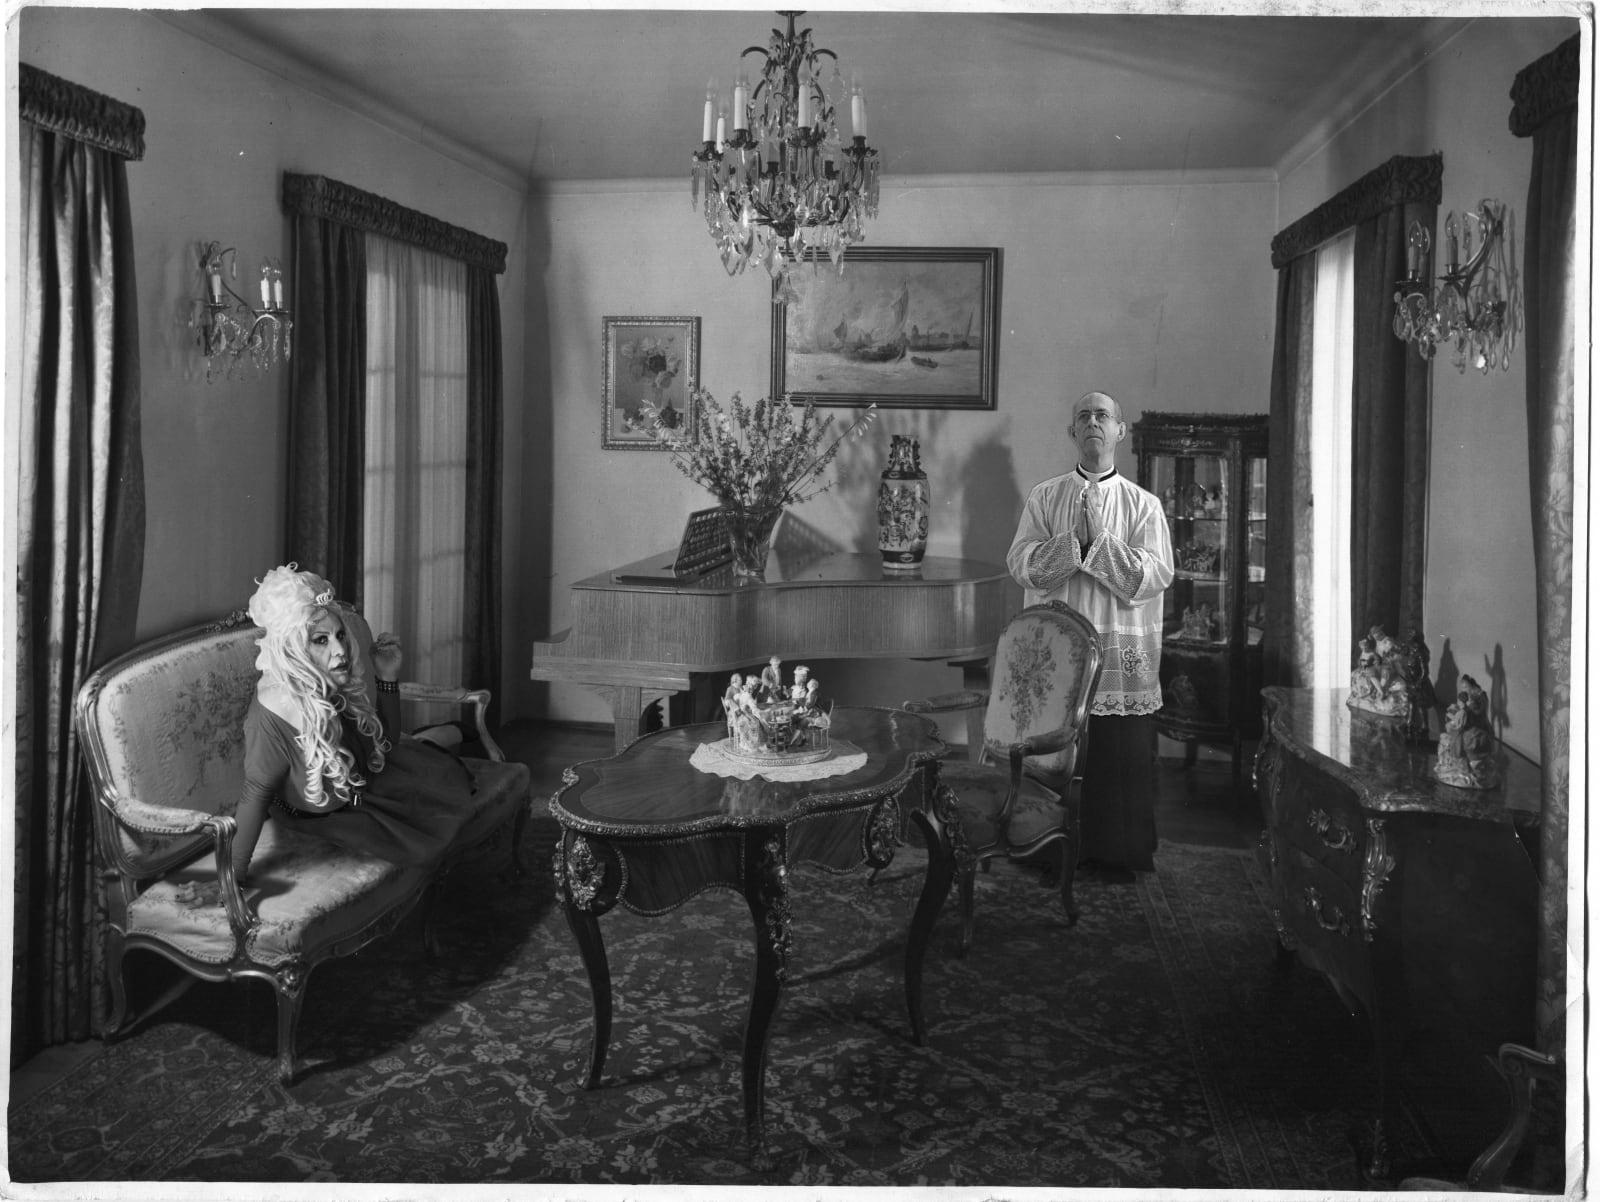 Juvenal Barría, Ficciones Interiores n° 4, 2016, Digital montage on found vintage photograph, digital print on Epson Luster Premium, old plaster frame, 55 x 77 cm. Limited edition, 1 + AP.